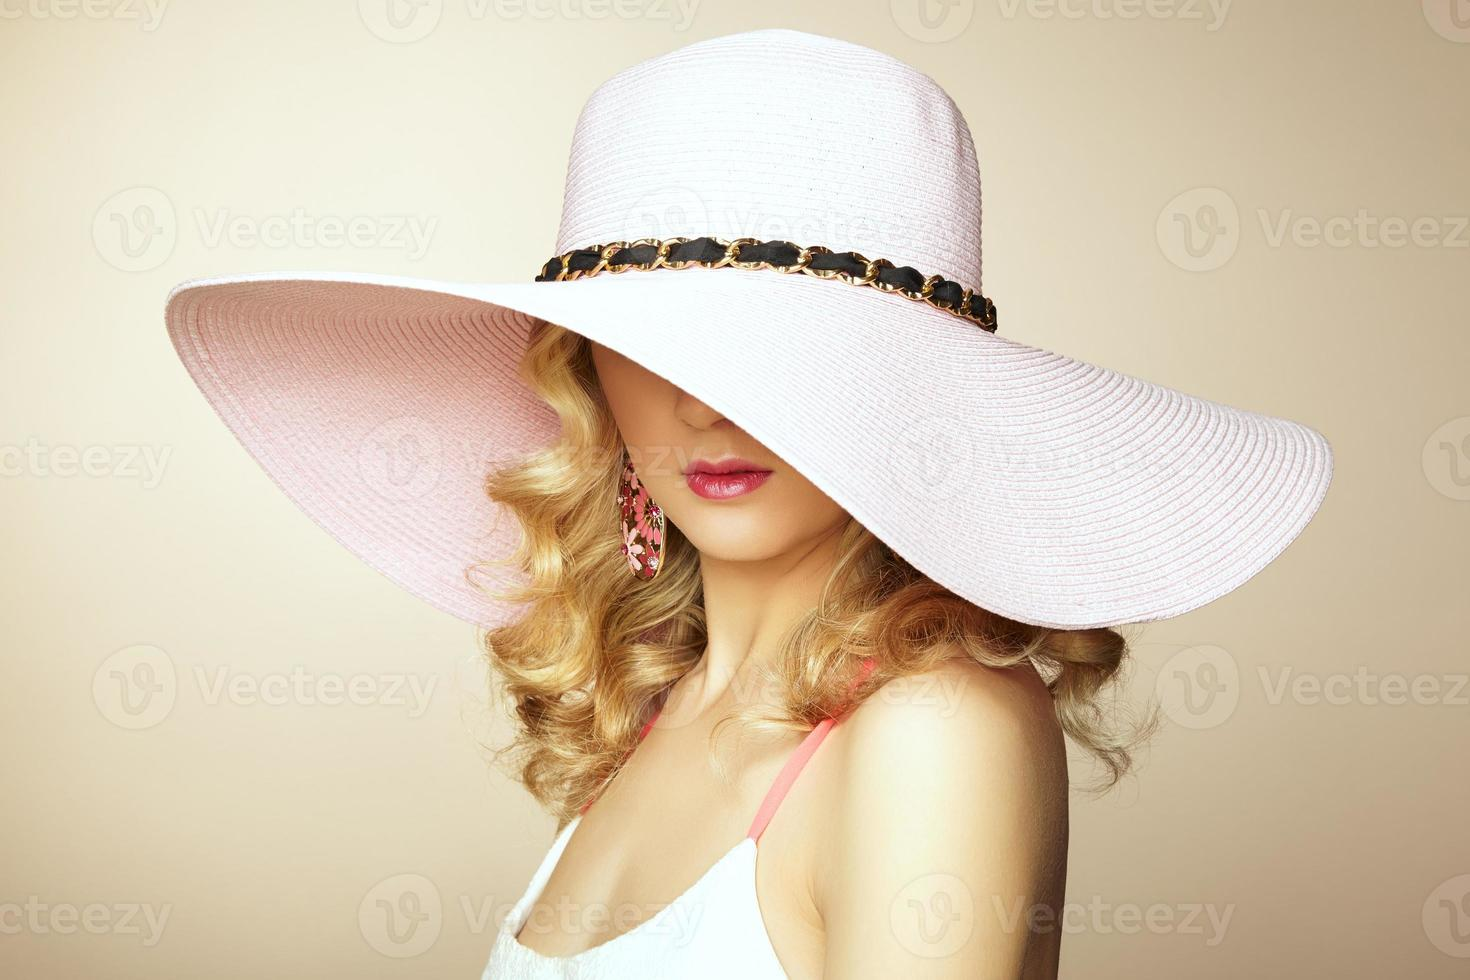 Foto de moda de joven magnífica mujer con sombrero. chica posando